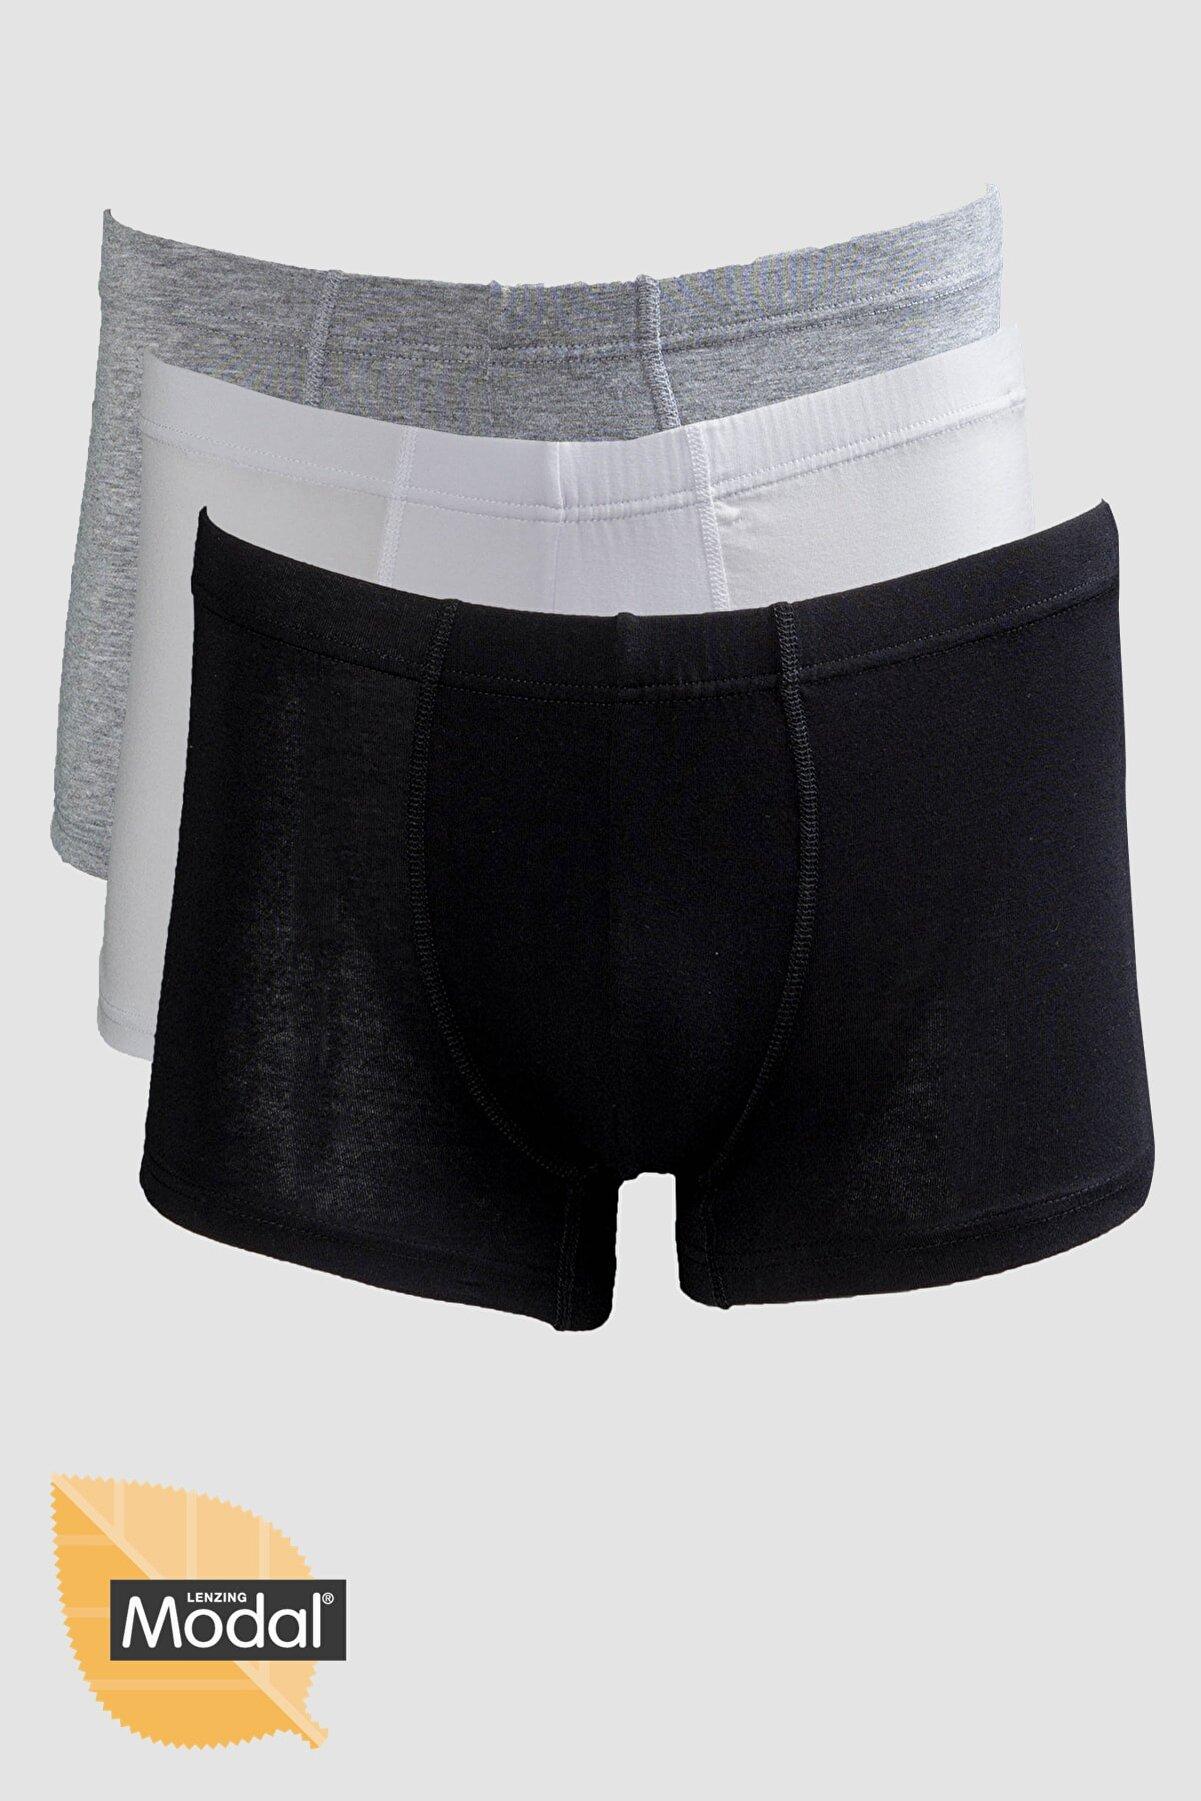 BSM Erkek 3'lü Modal Pamuk Siyah Beyaz Gri Kısa Boxer